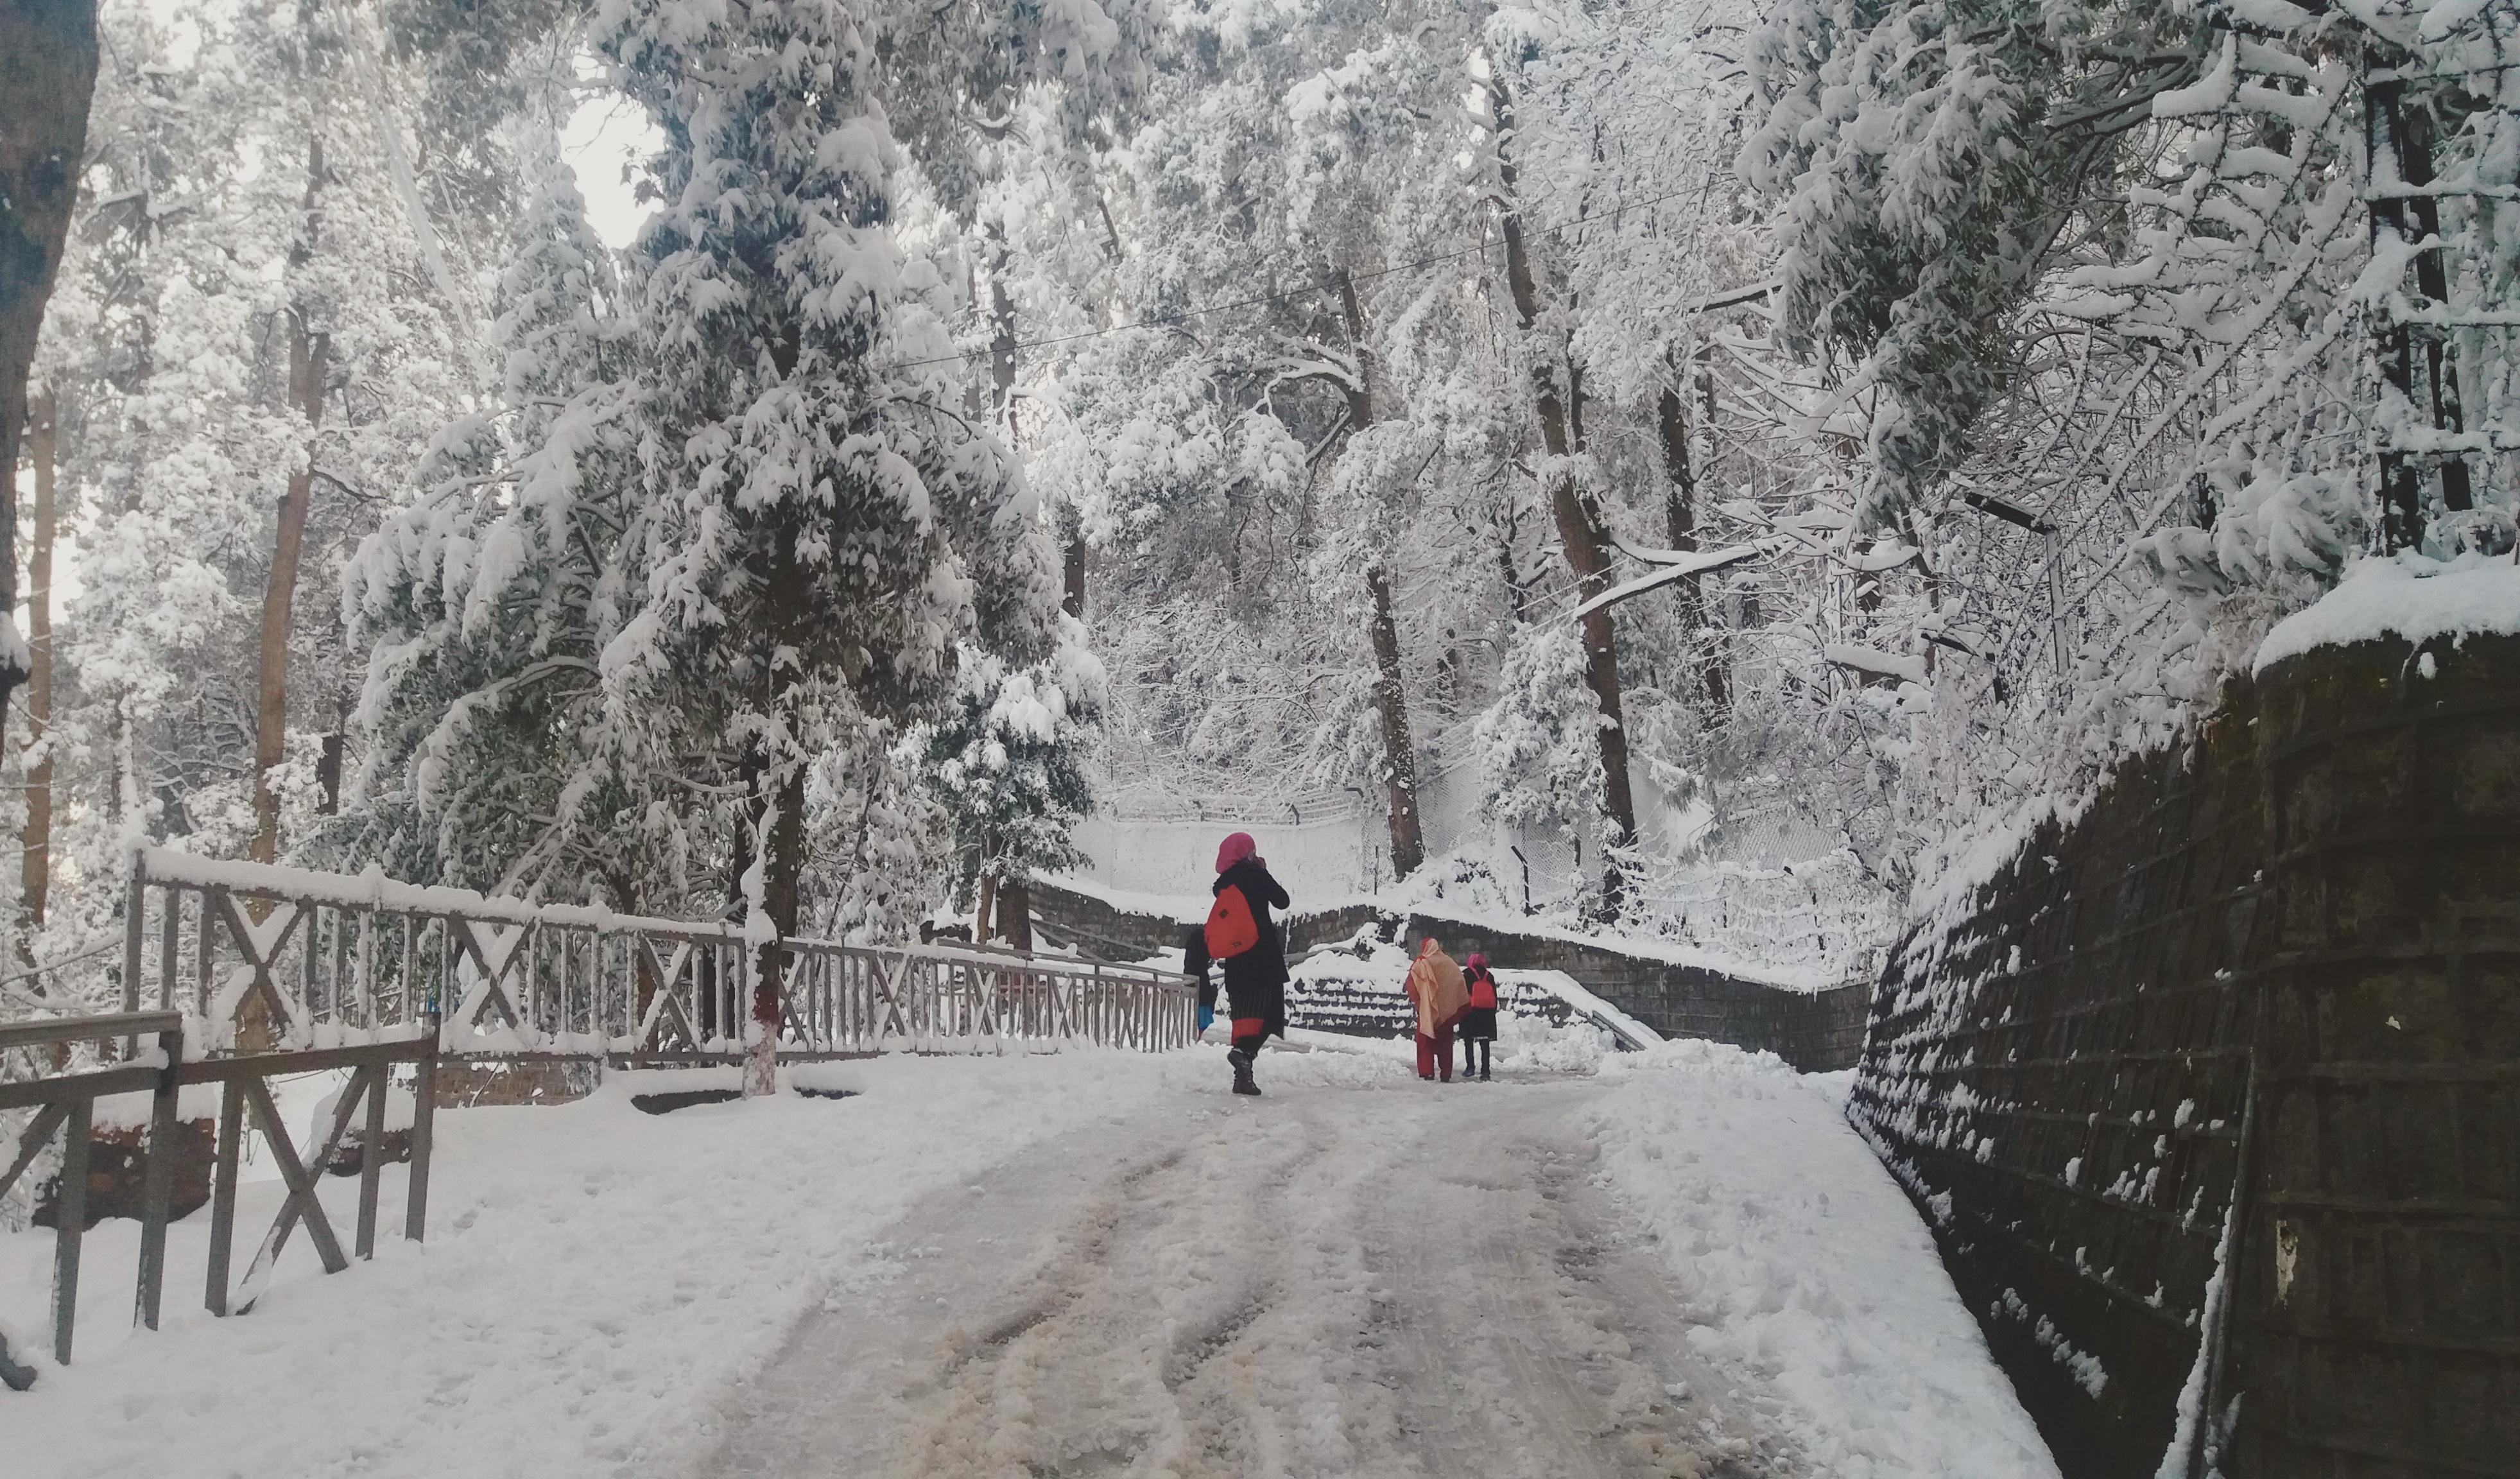 Free Snow Falling Wallpaper File Murree Pakistan Jpg Wikimedia Commons